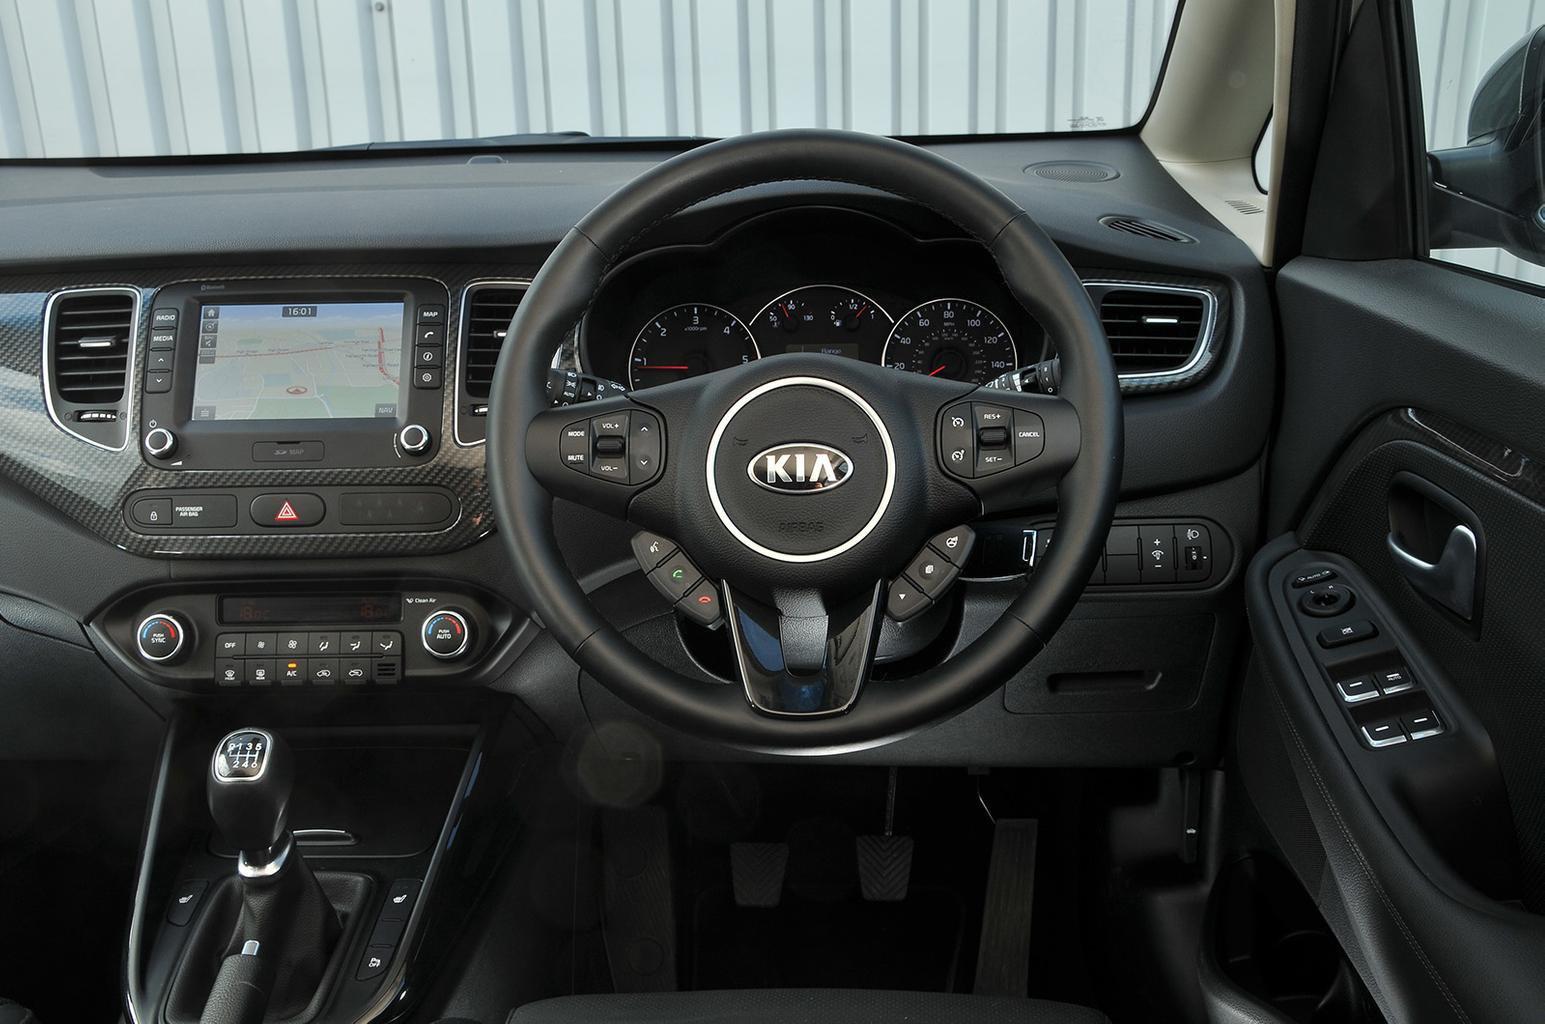 Kia Carens - interior